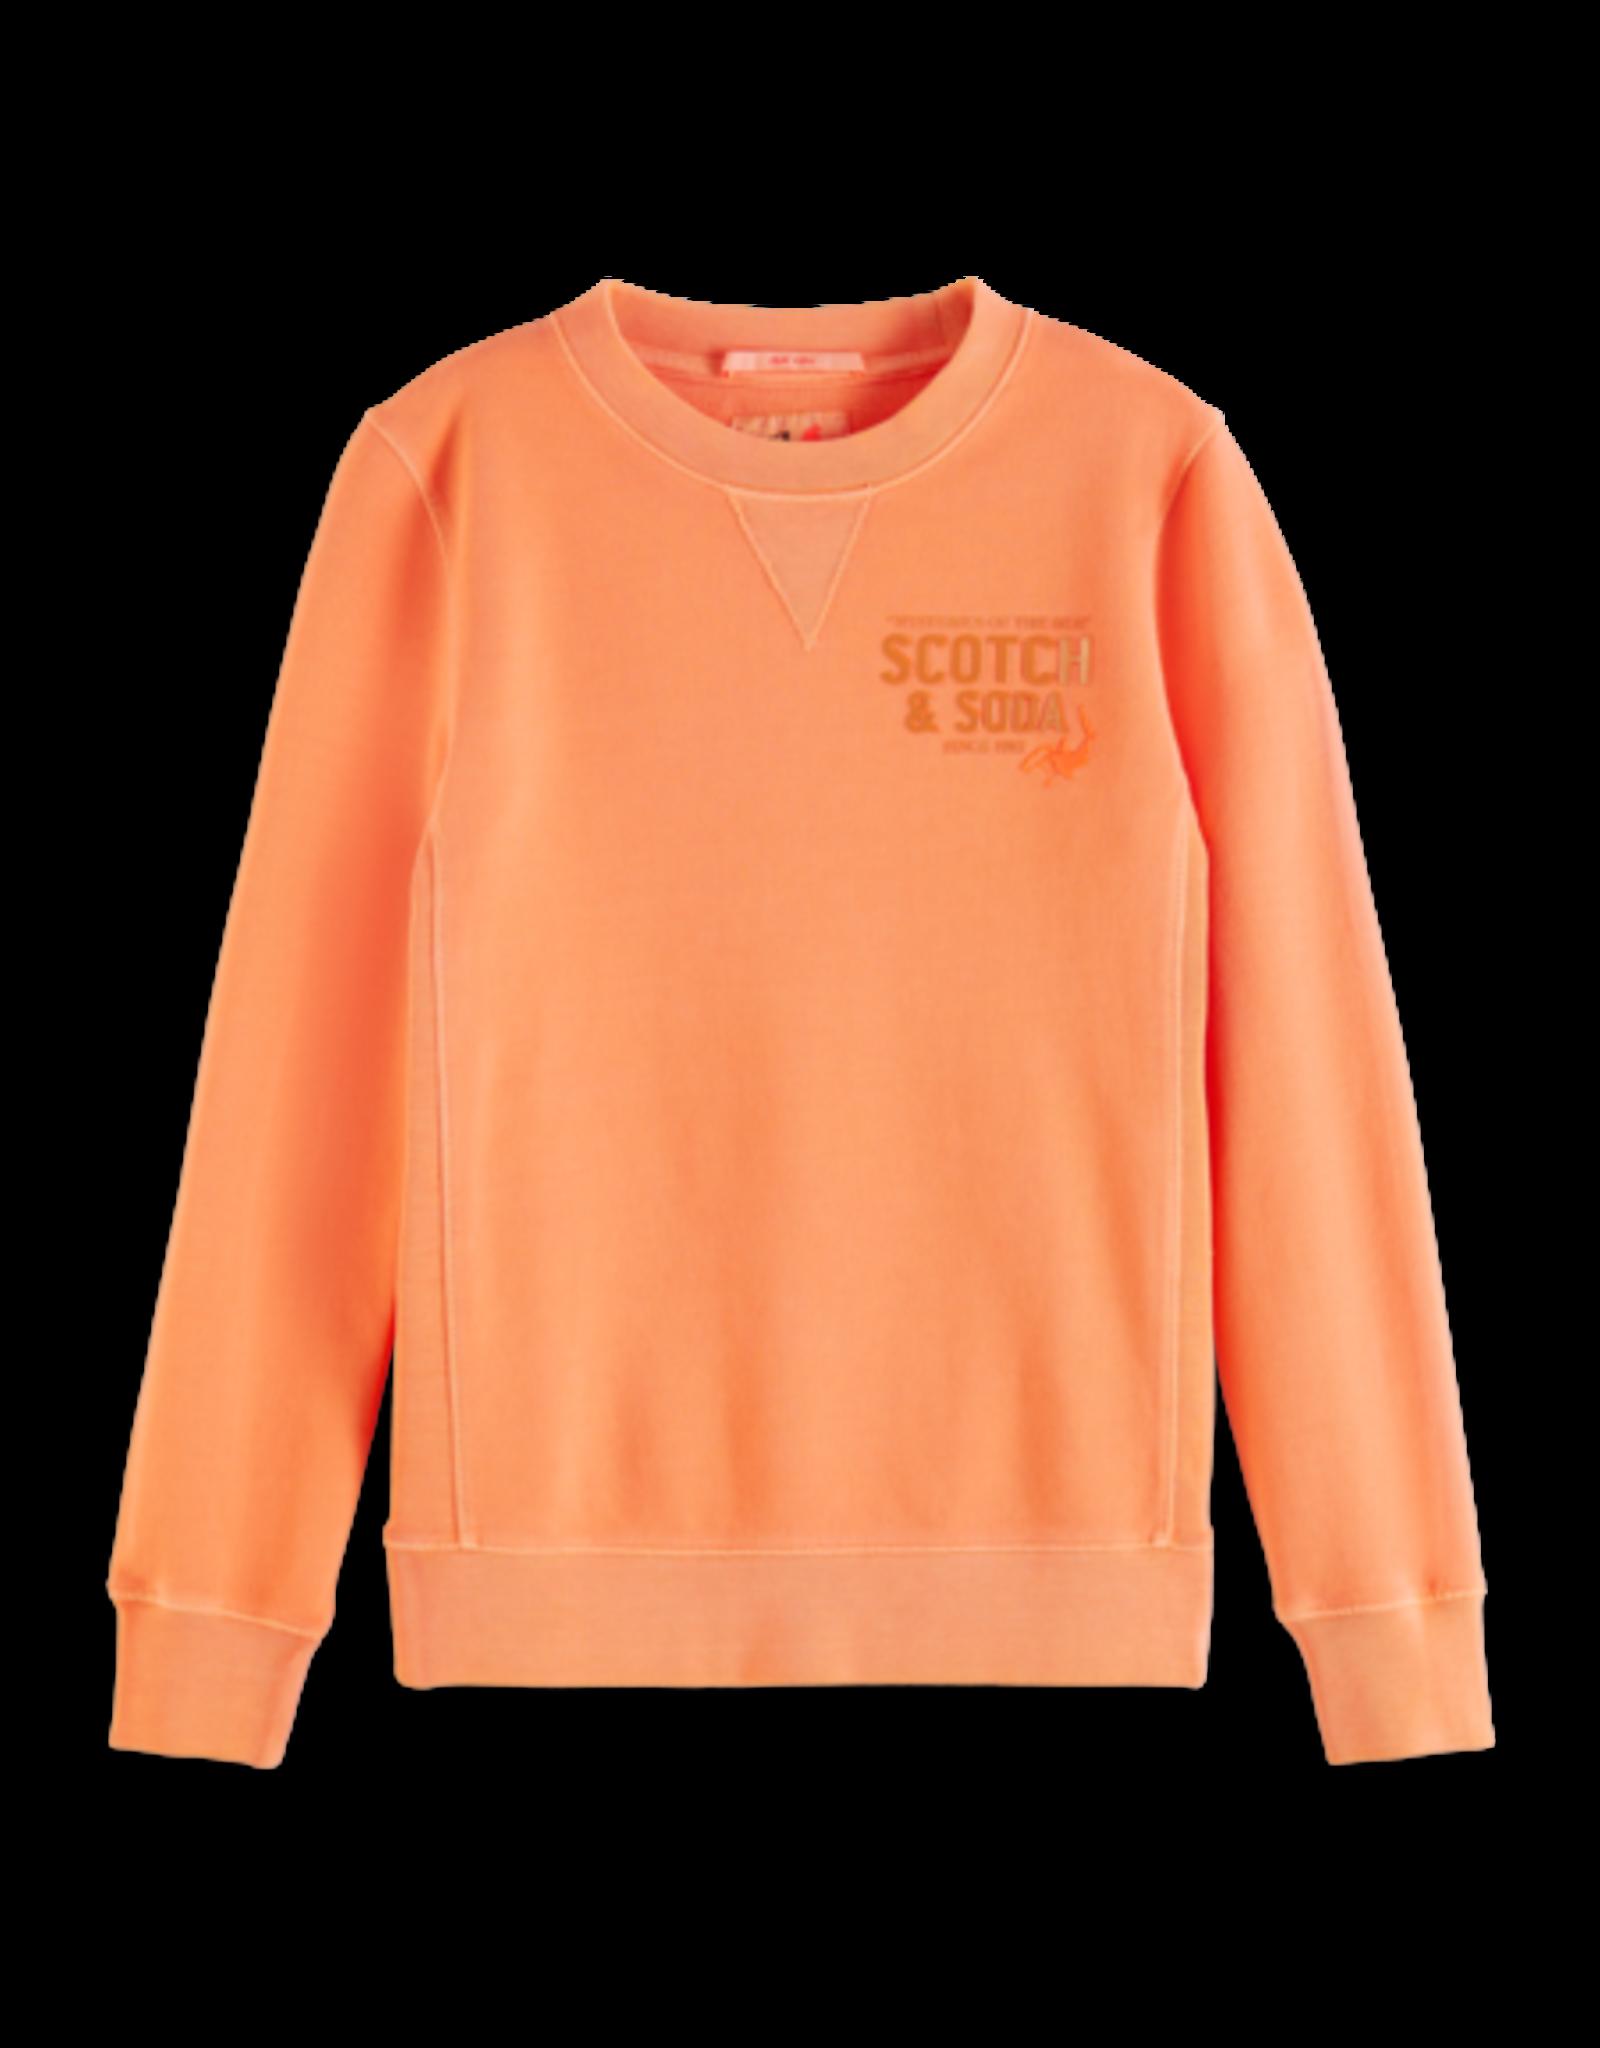 SCOTCH & SODA SCOTCH & SODA Sweater 161075